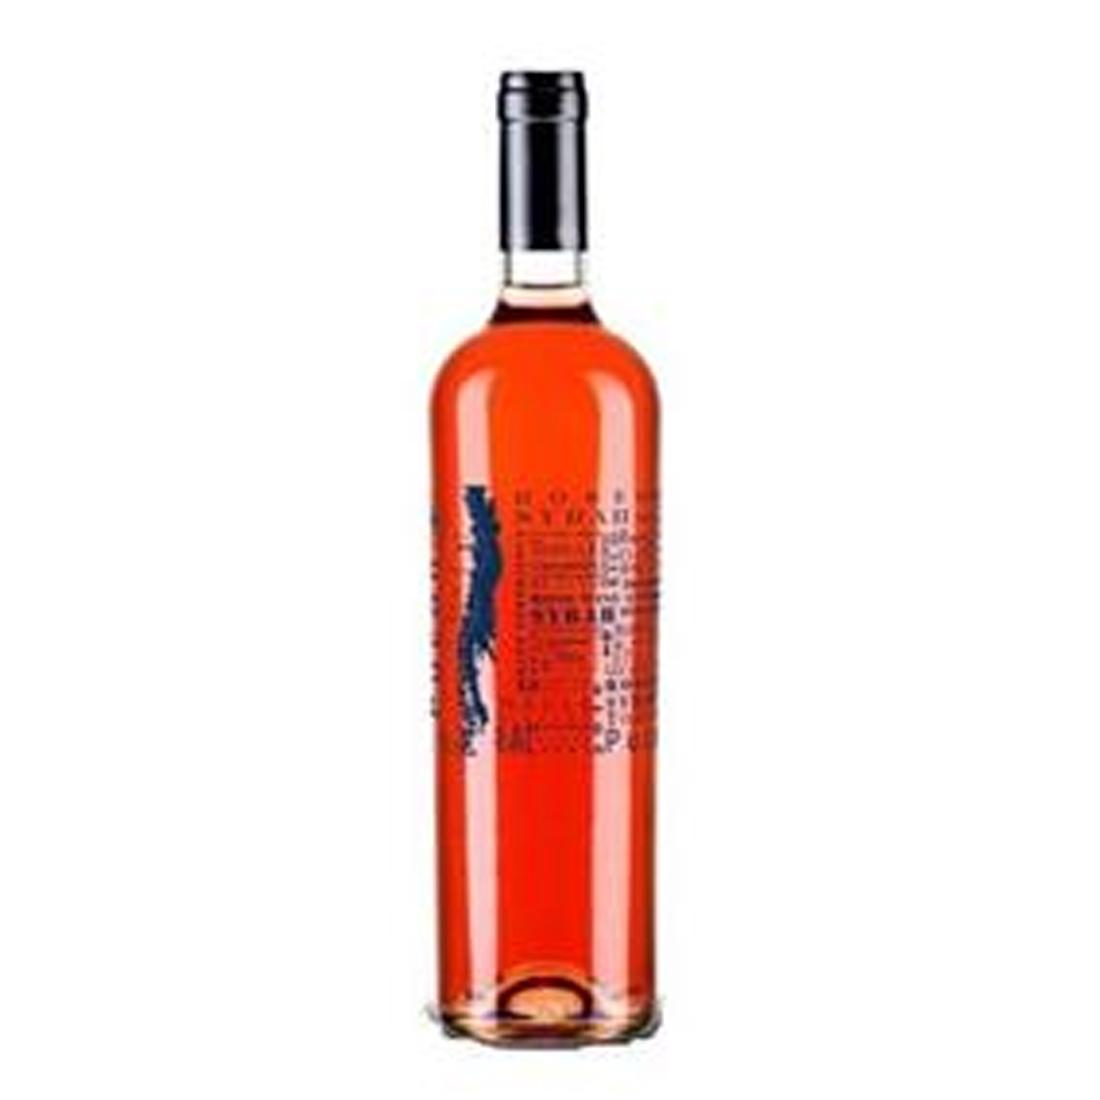 Vinho Pucon Rosé Syrah 750 ml